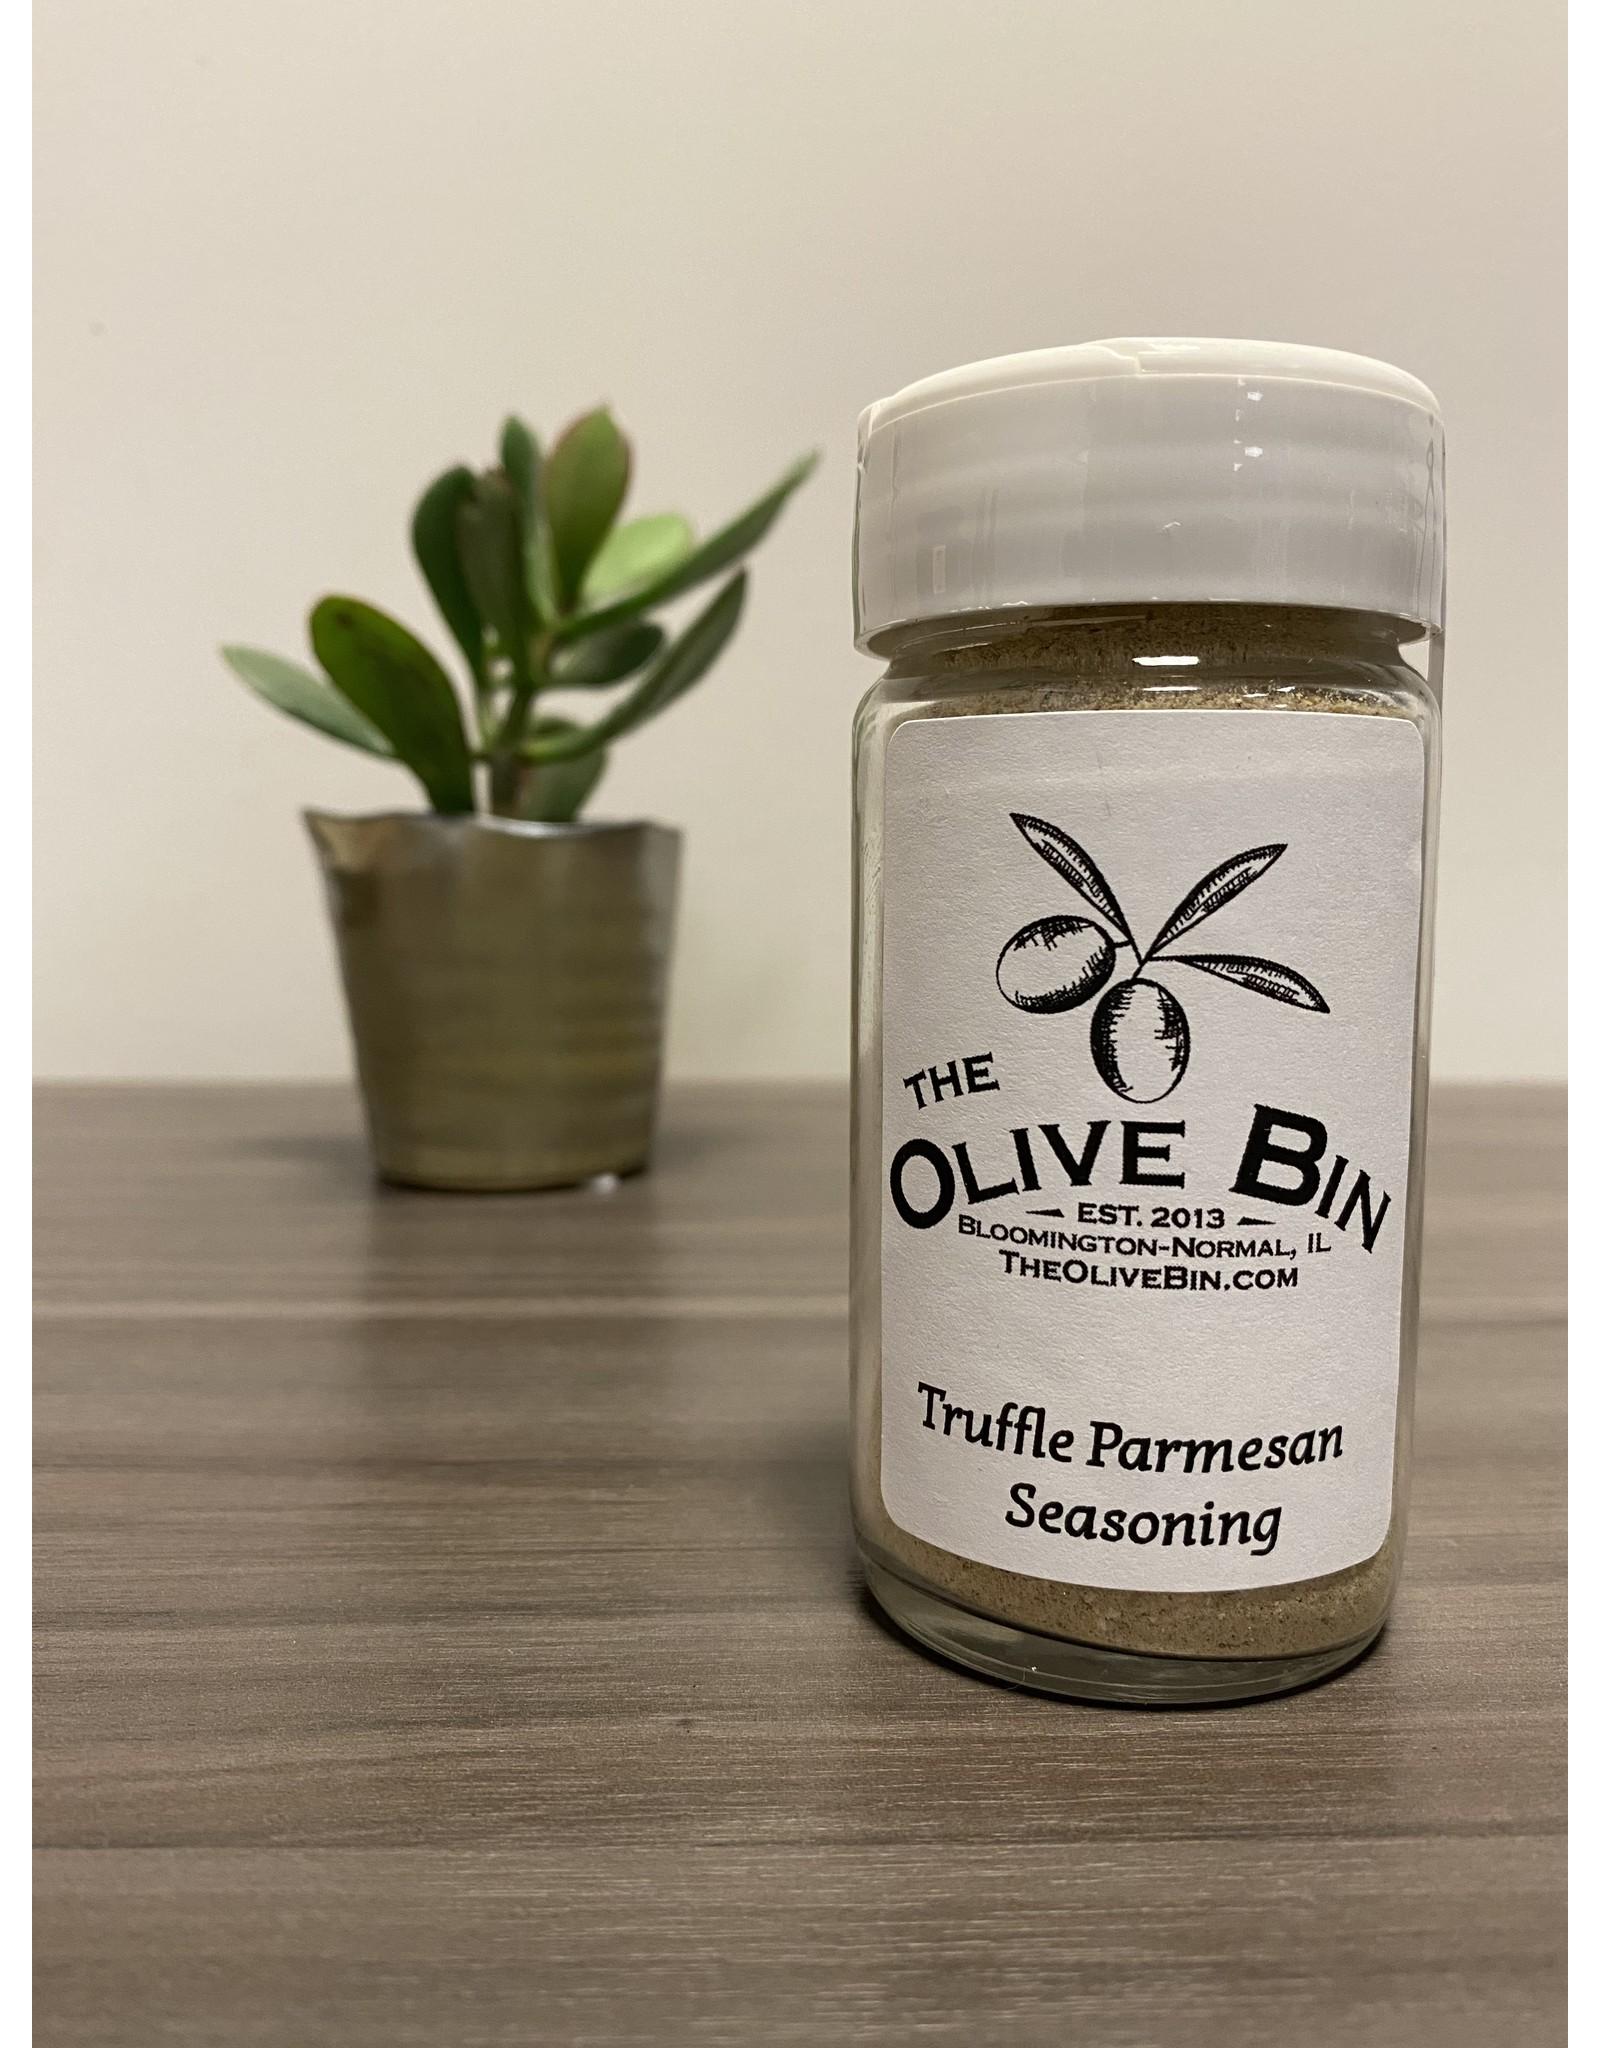 Truffle Parmesan Seasoning